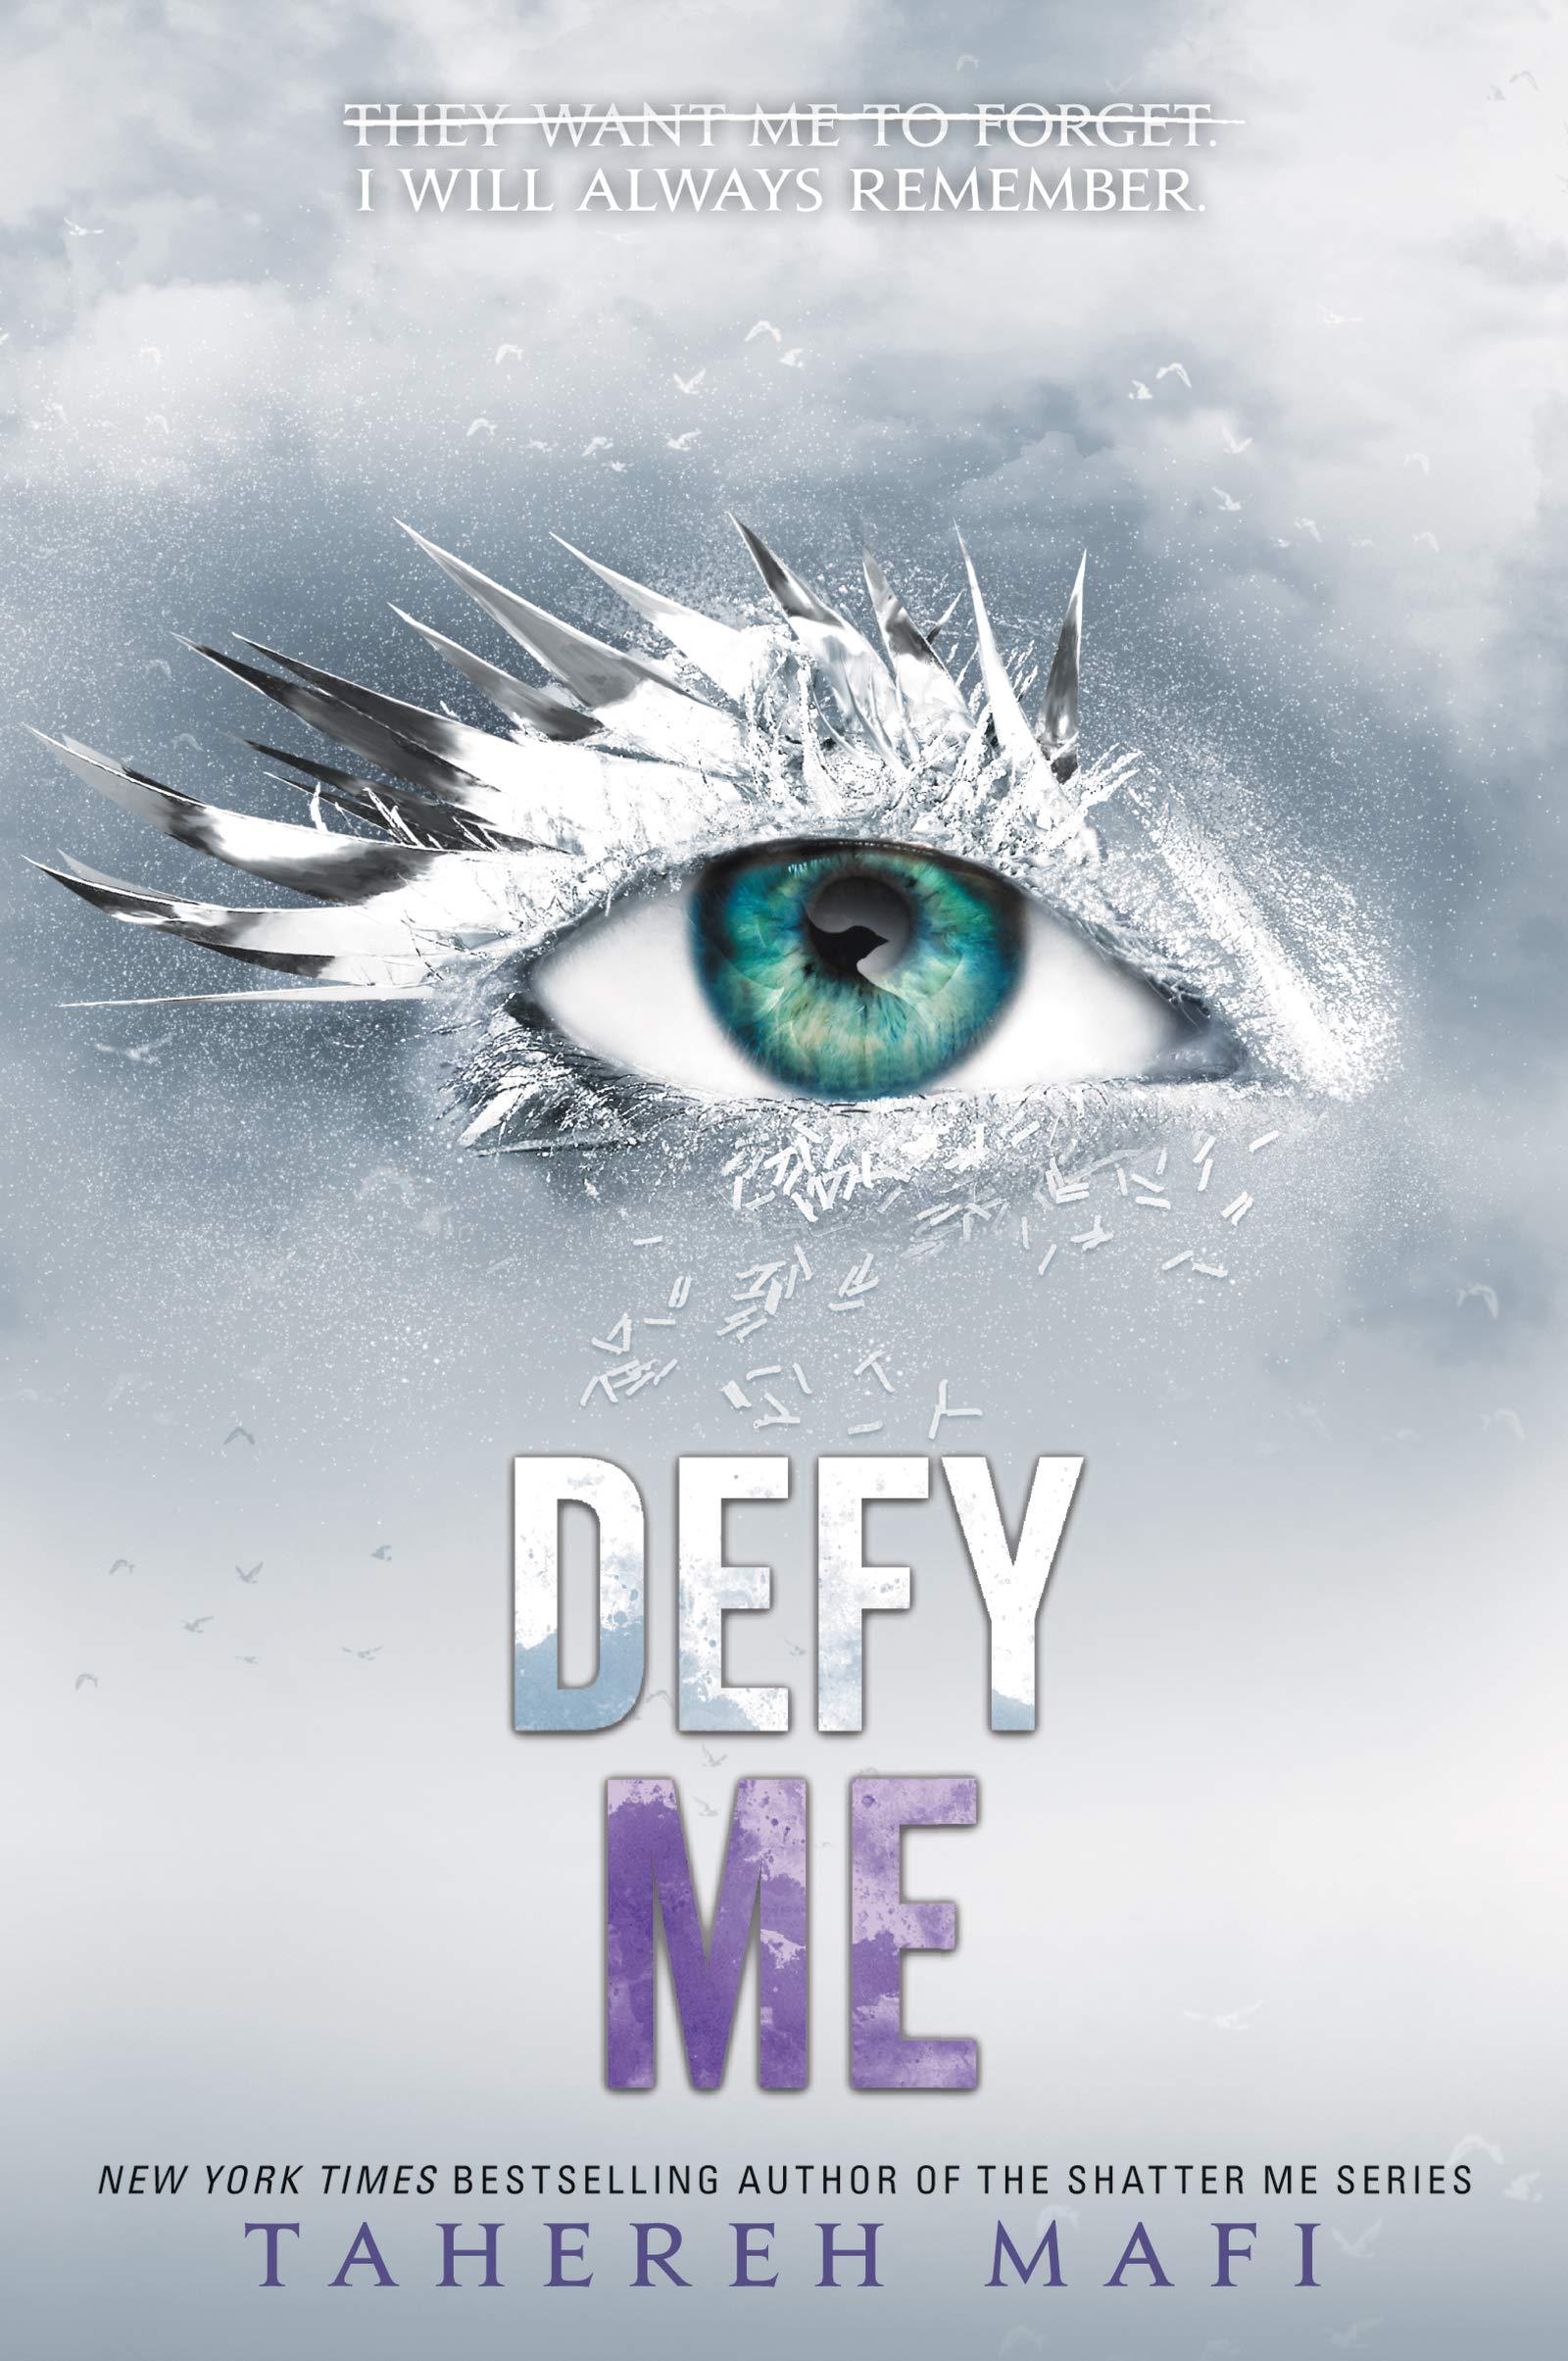 Amazon.com: Defy Me (Shatter Me Book 5) (9780062676405): Mafi, Tahereh:  Books